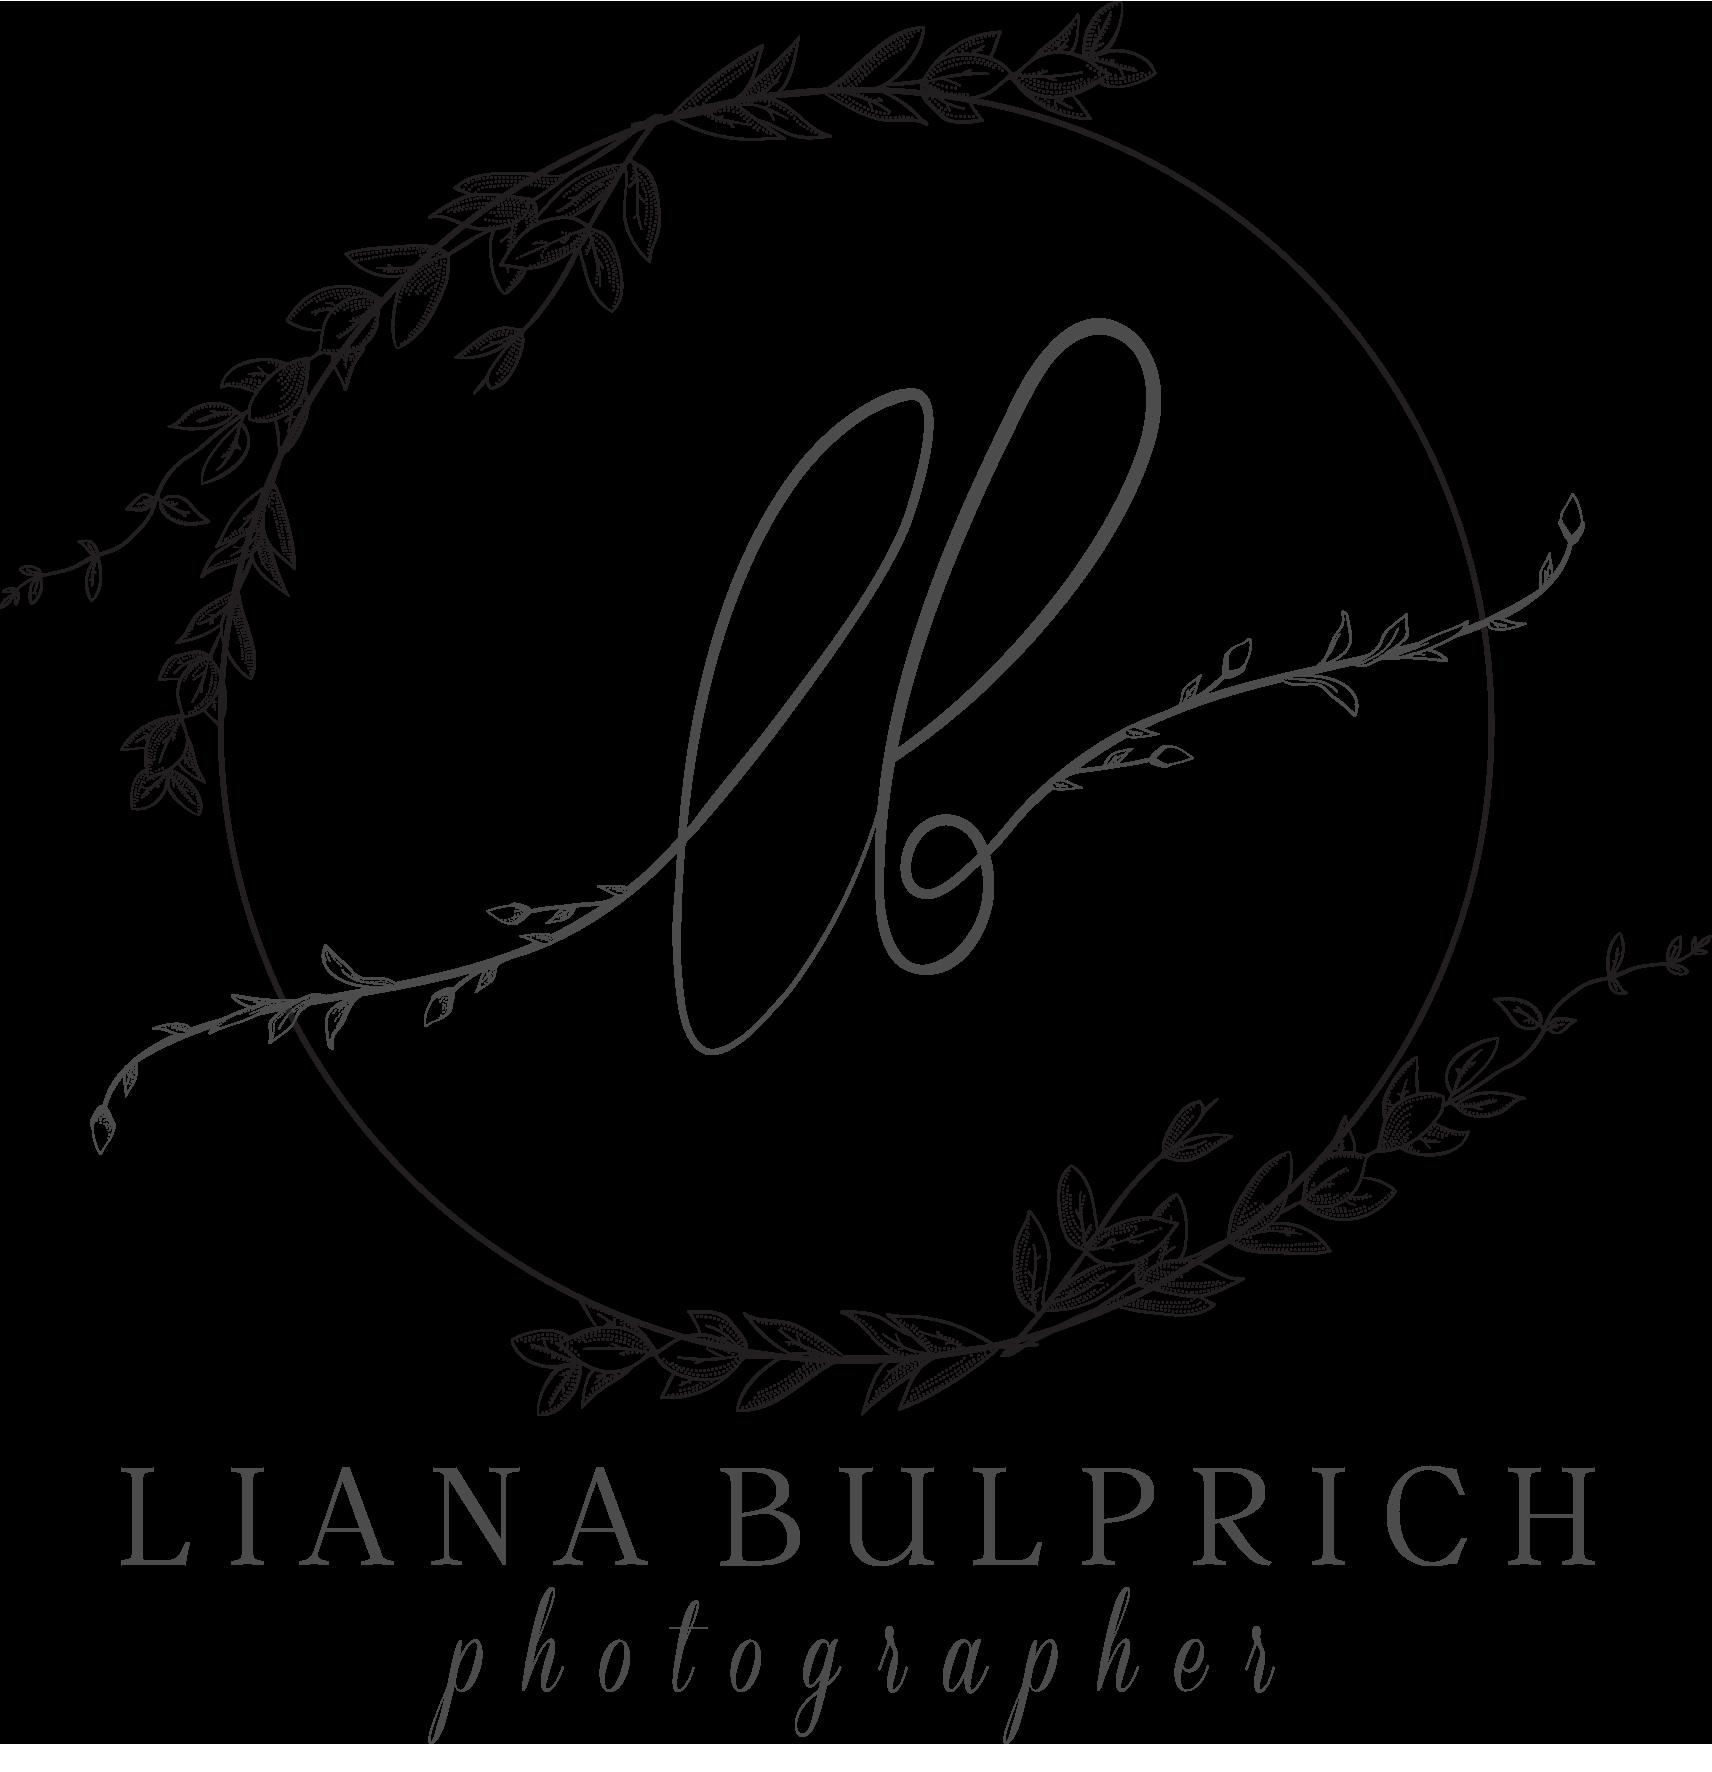 Liana Bulprich